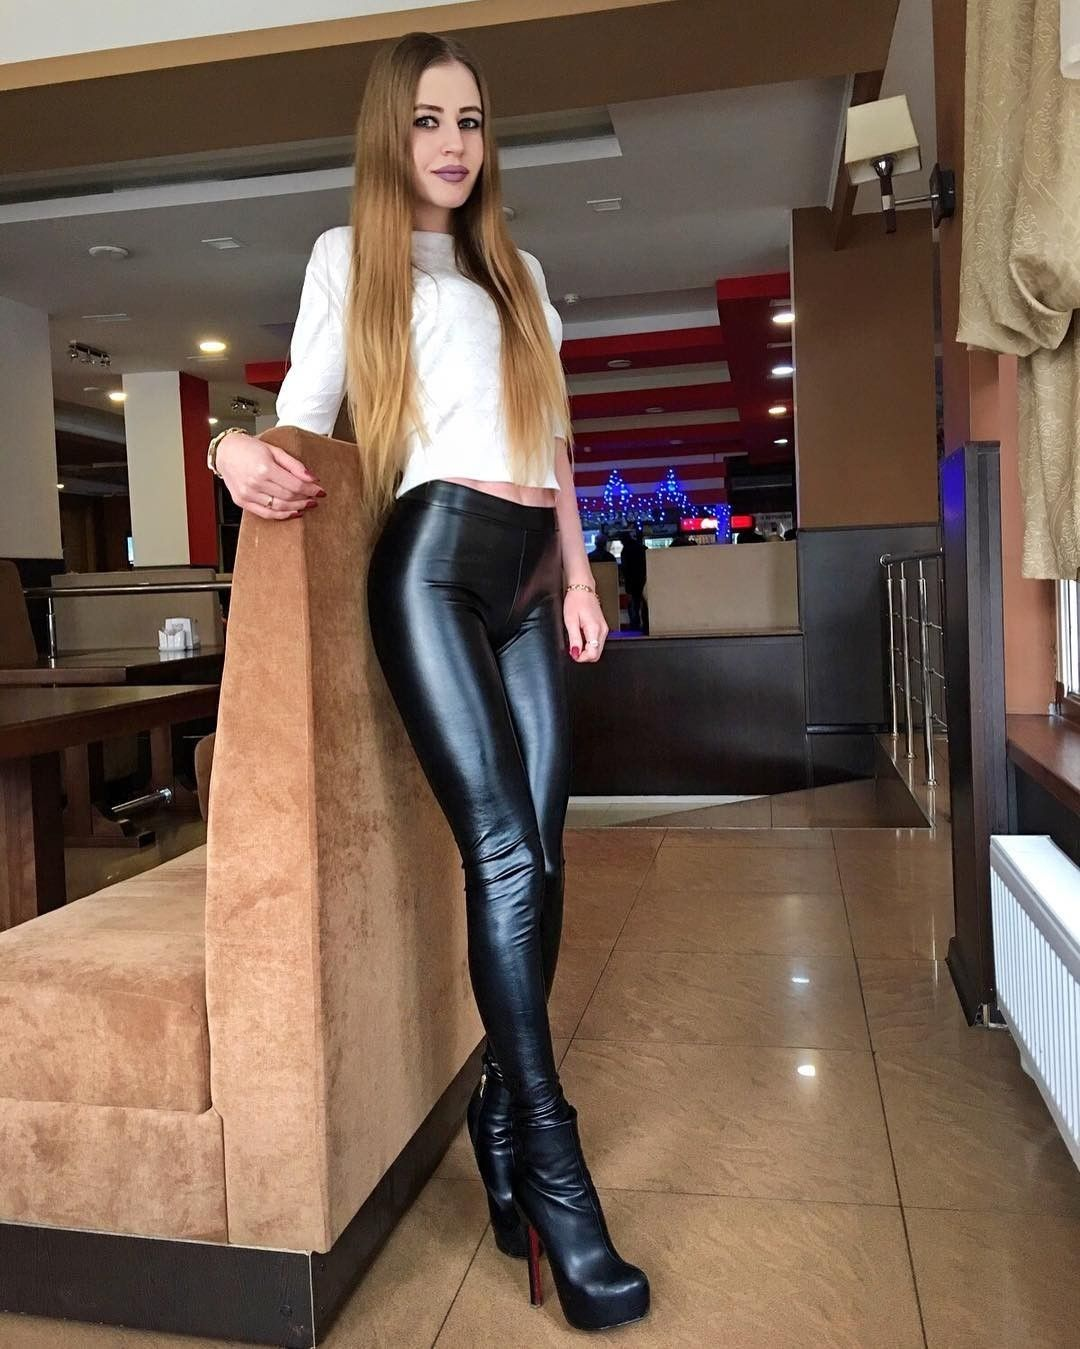 ca5f23b2637 Leather look leggings